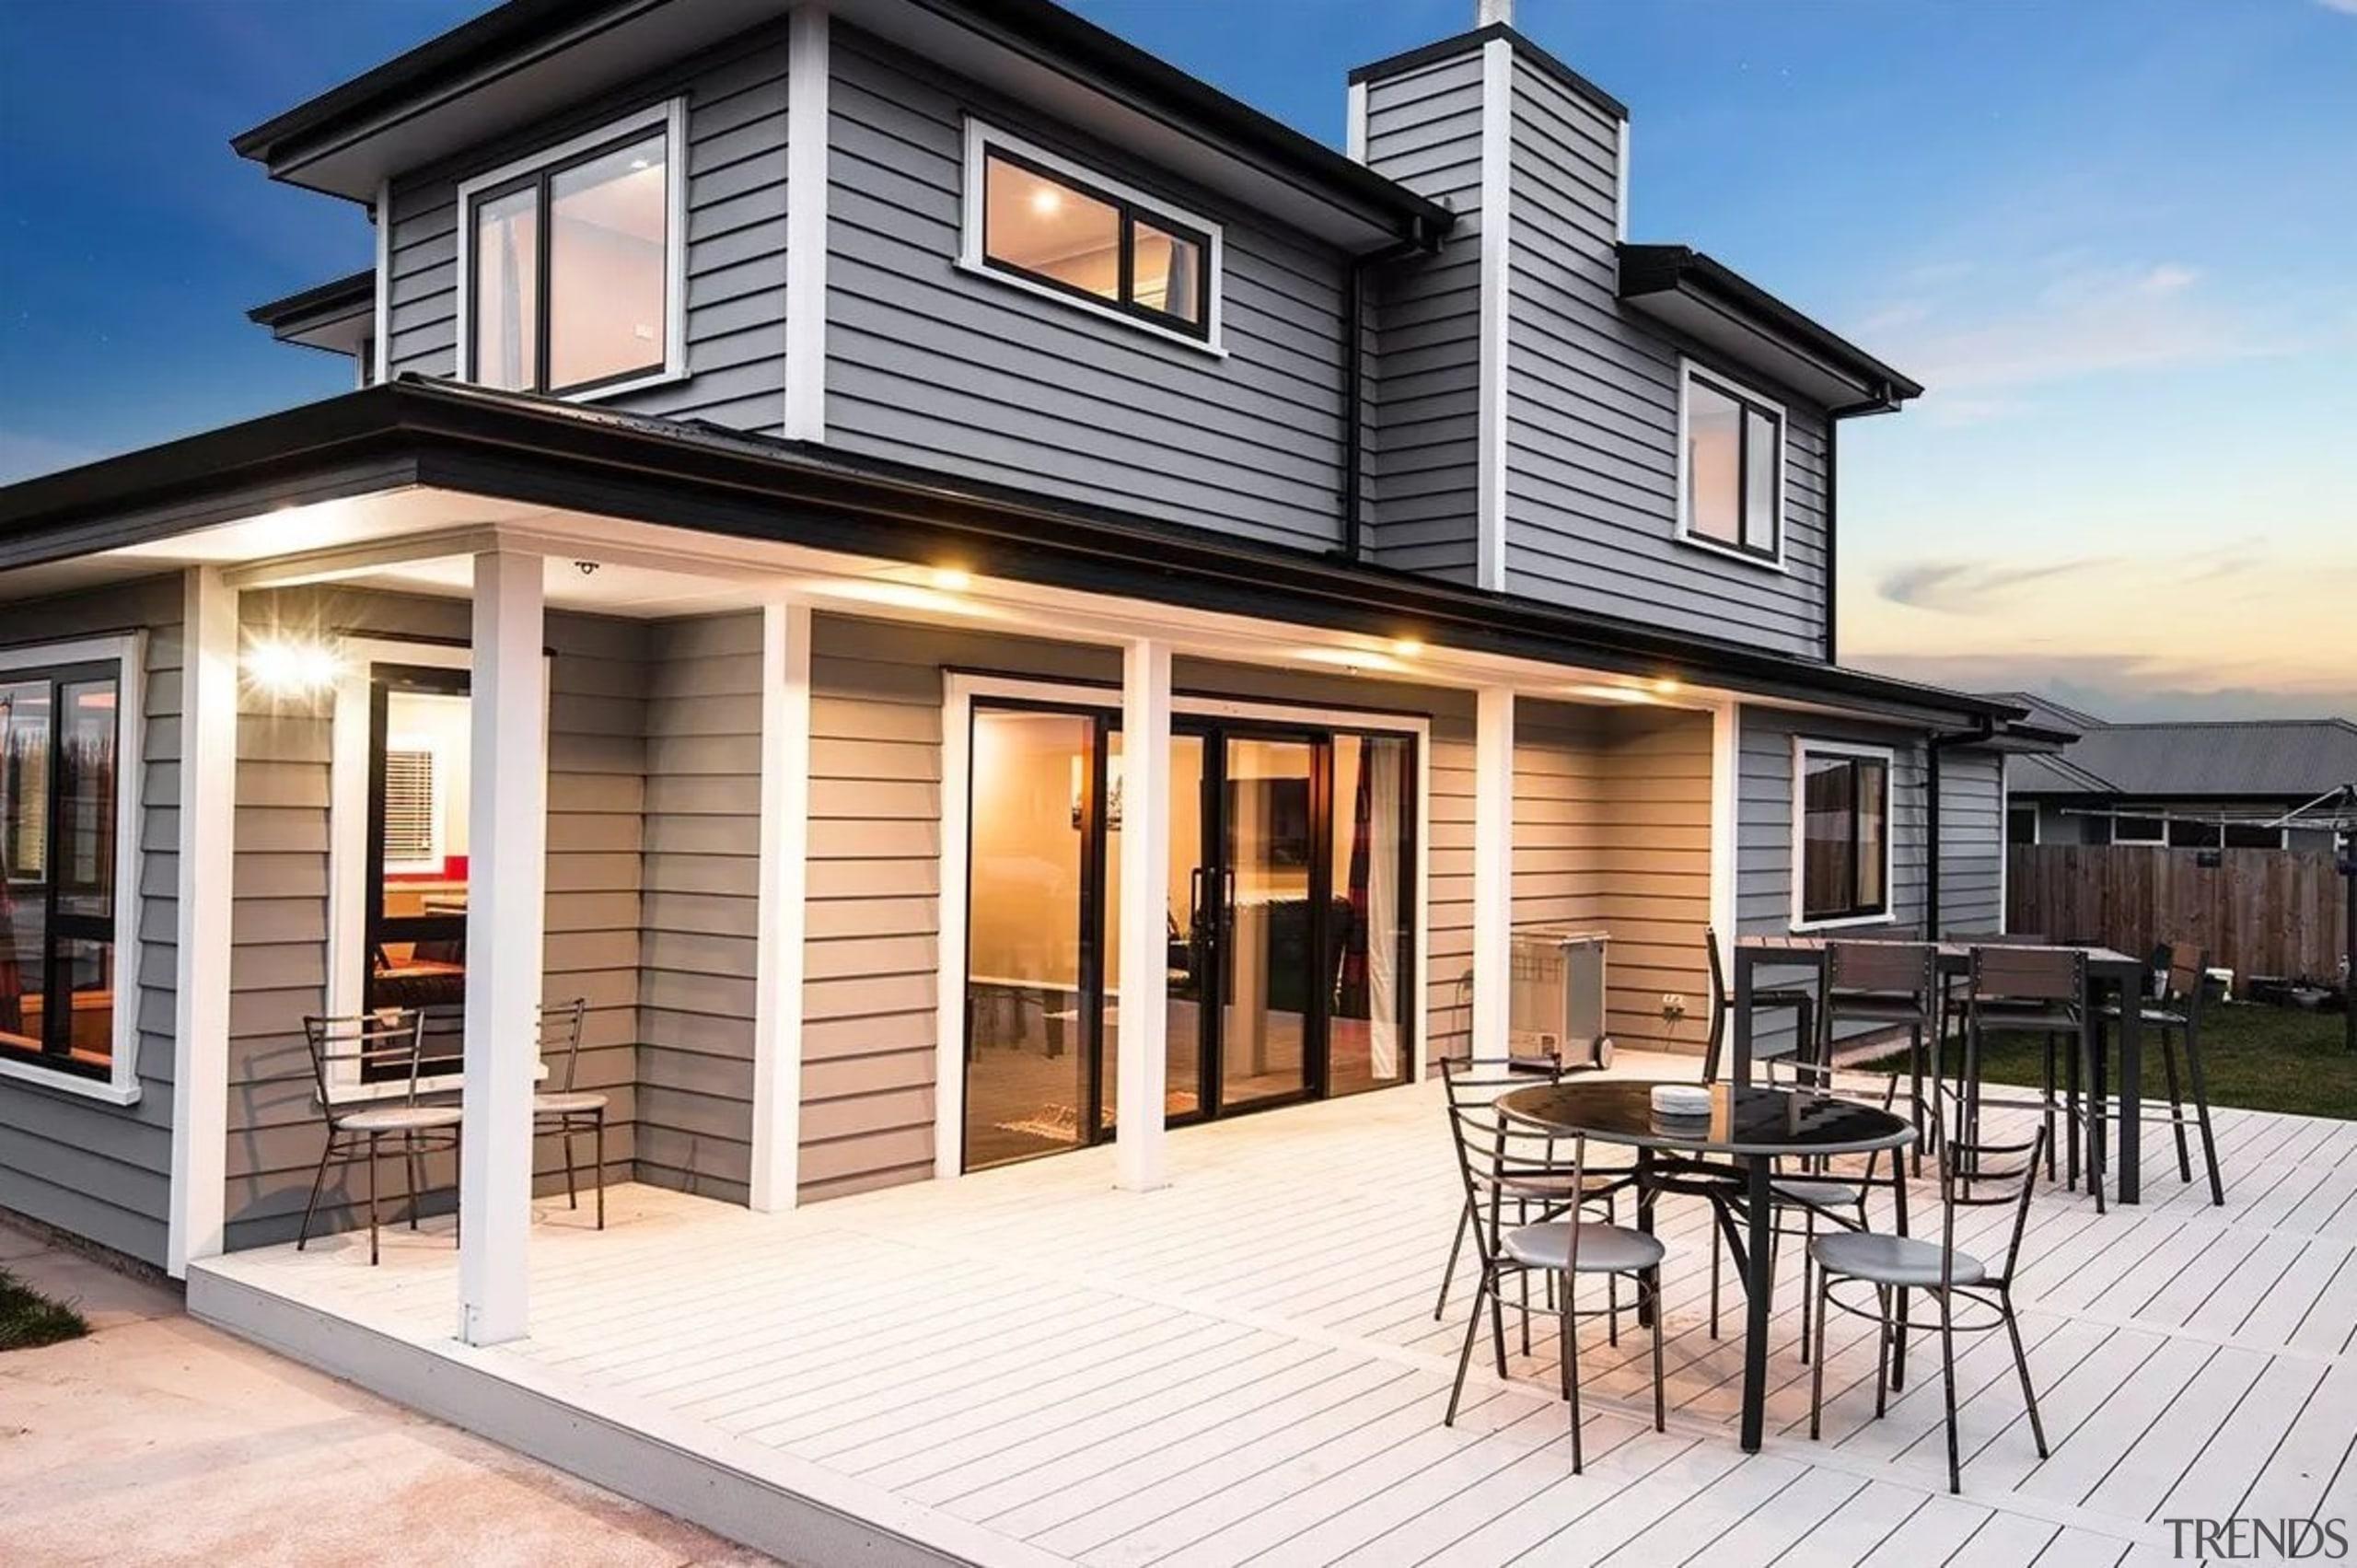 Envira bevel back weatherboards - Envira bevel back cottage, elevation, facade, home, house, property, real estate, siding, window, white